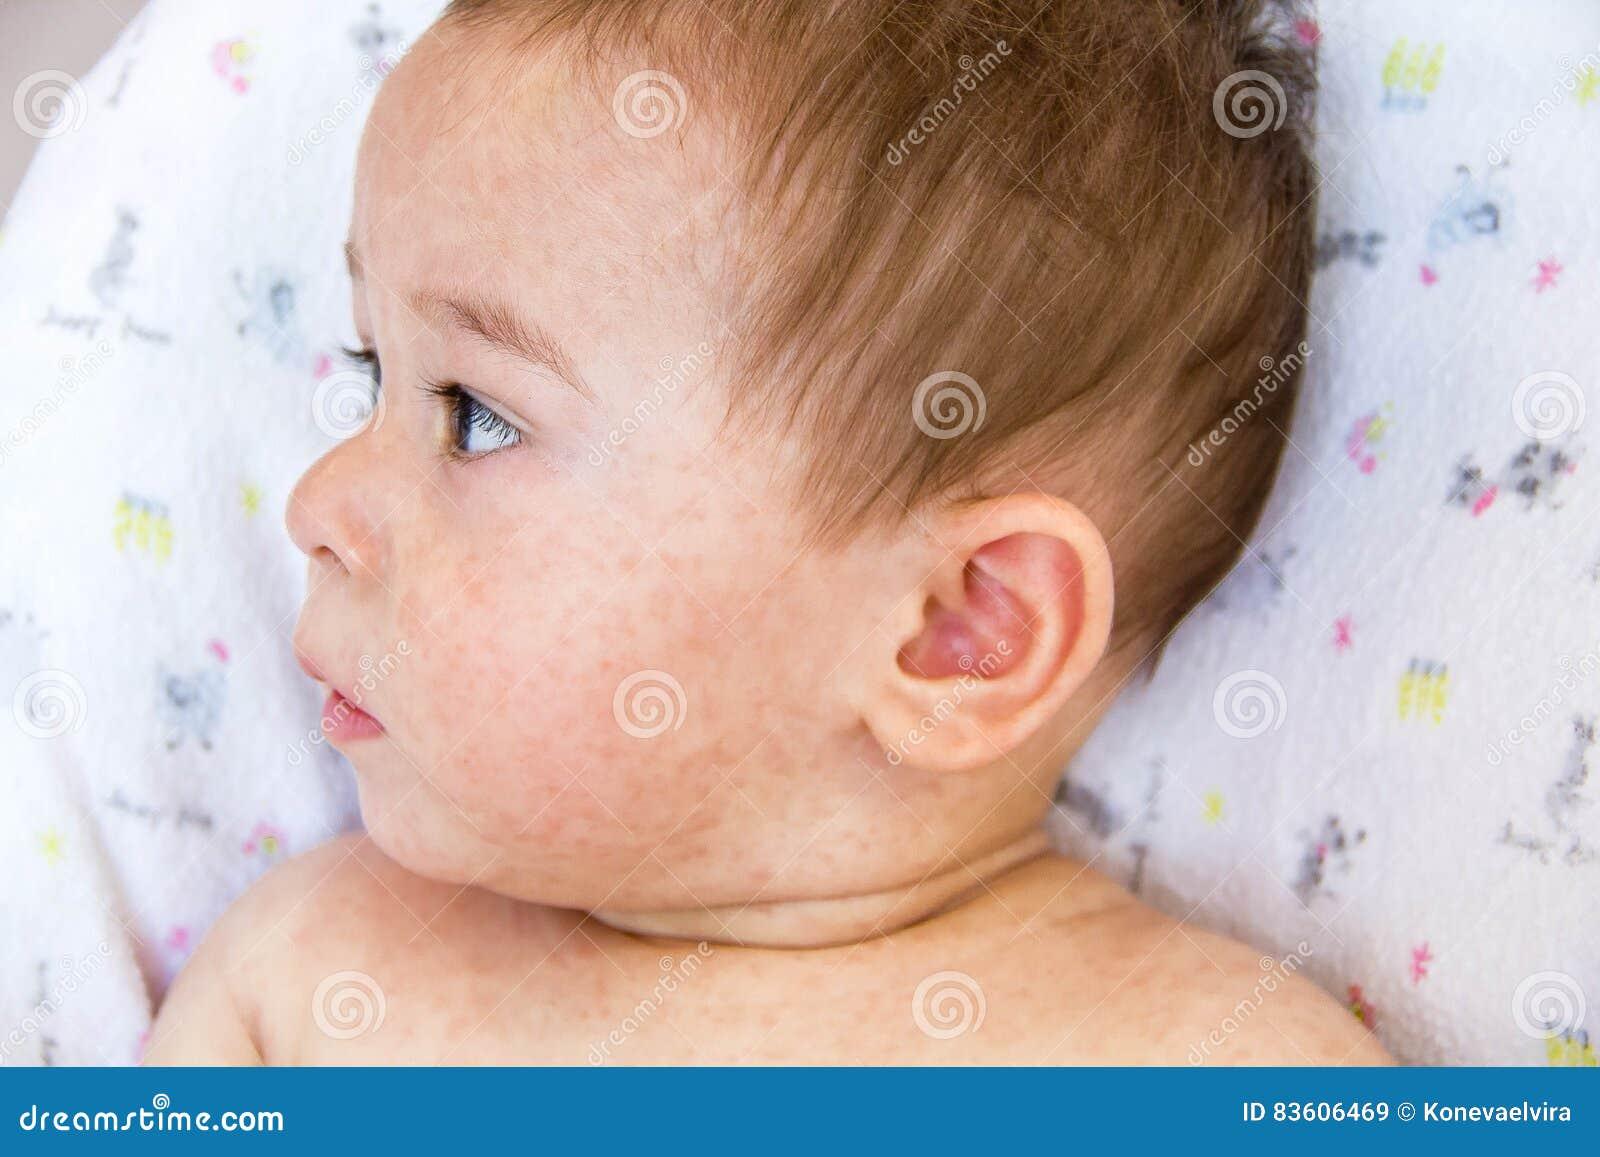 Allergy baby skin dermatitis food. child dermatitis symptom problem rash. face sleeping newborns. suffering atopic symptom on skin